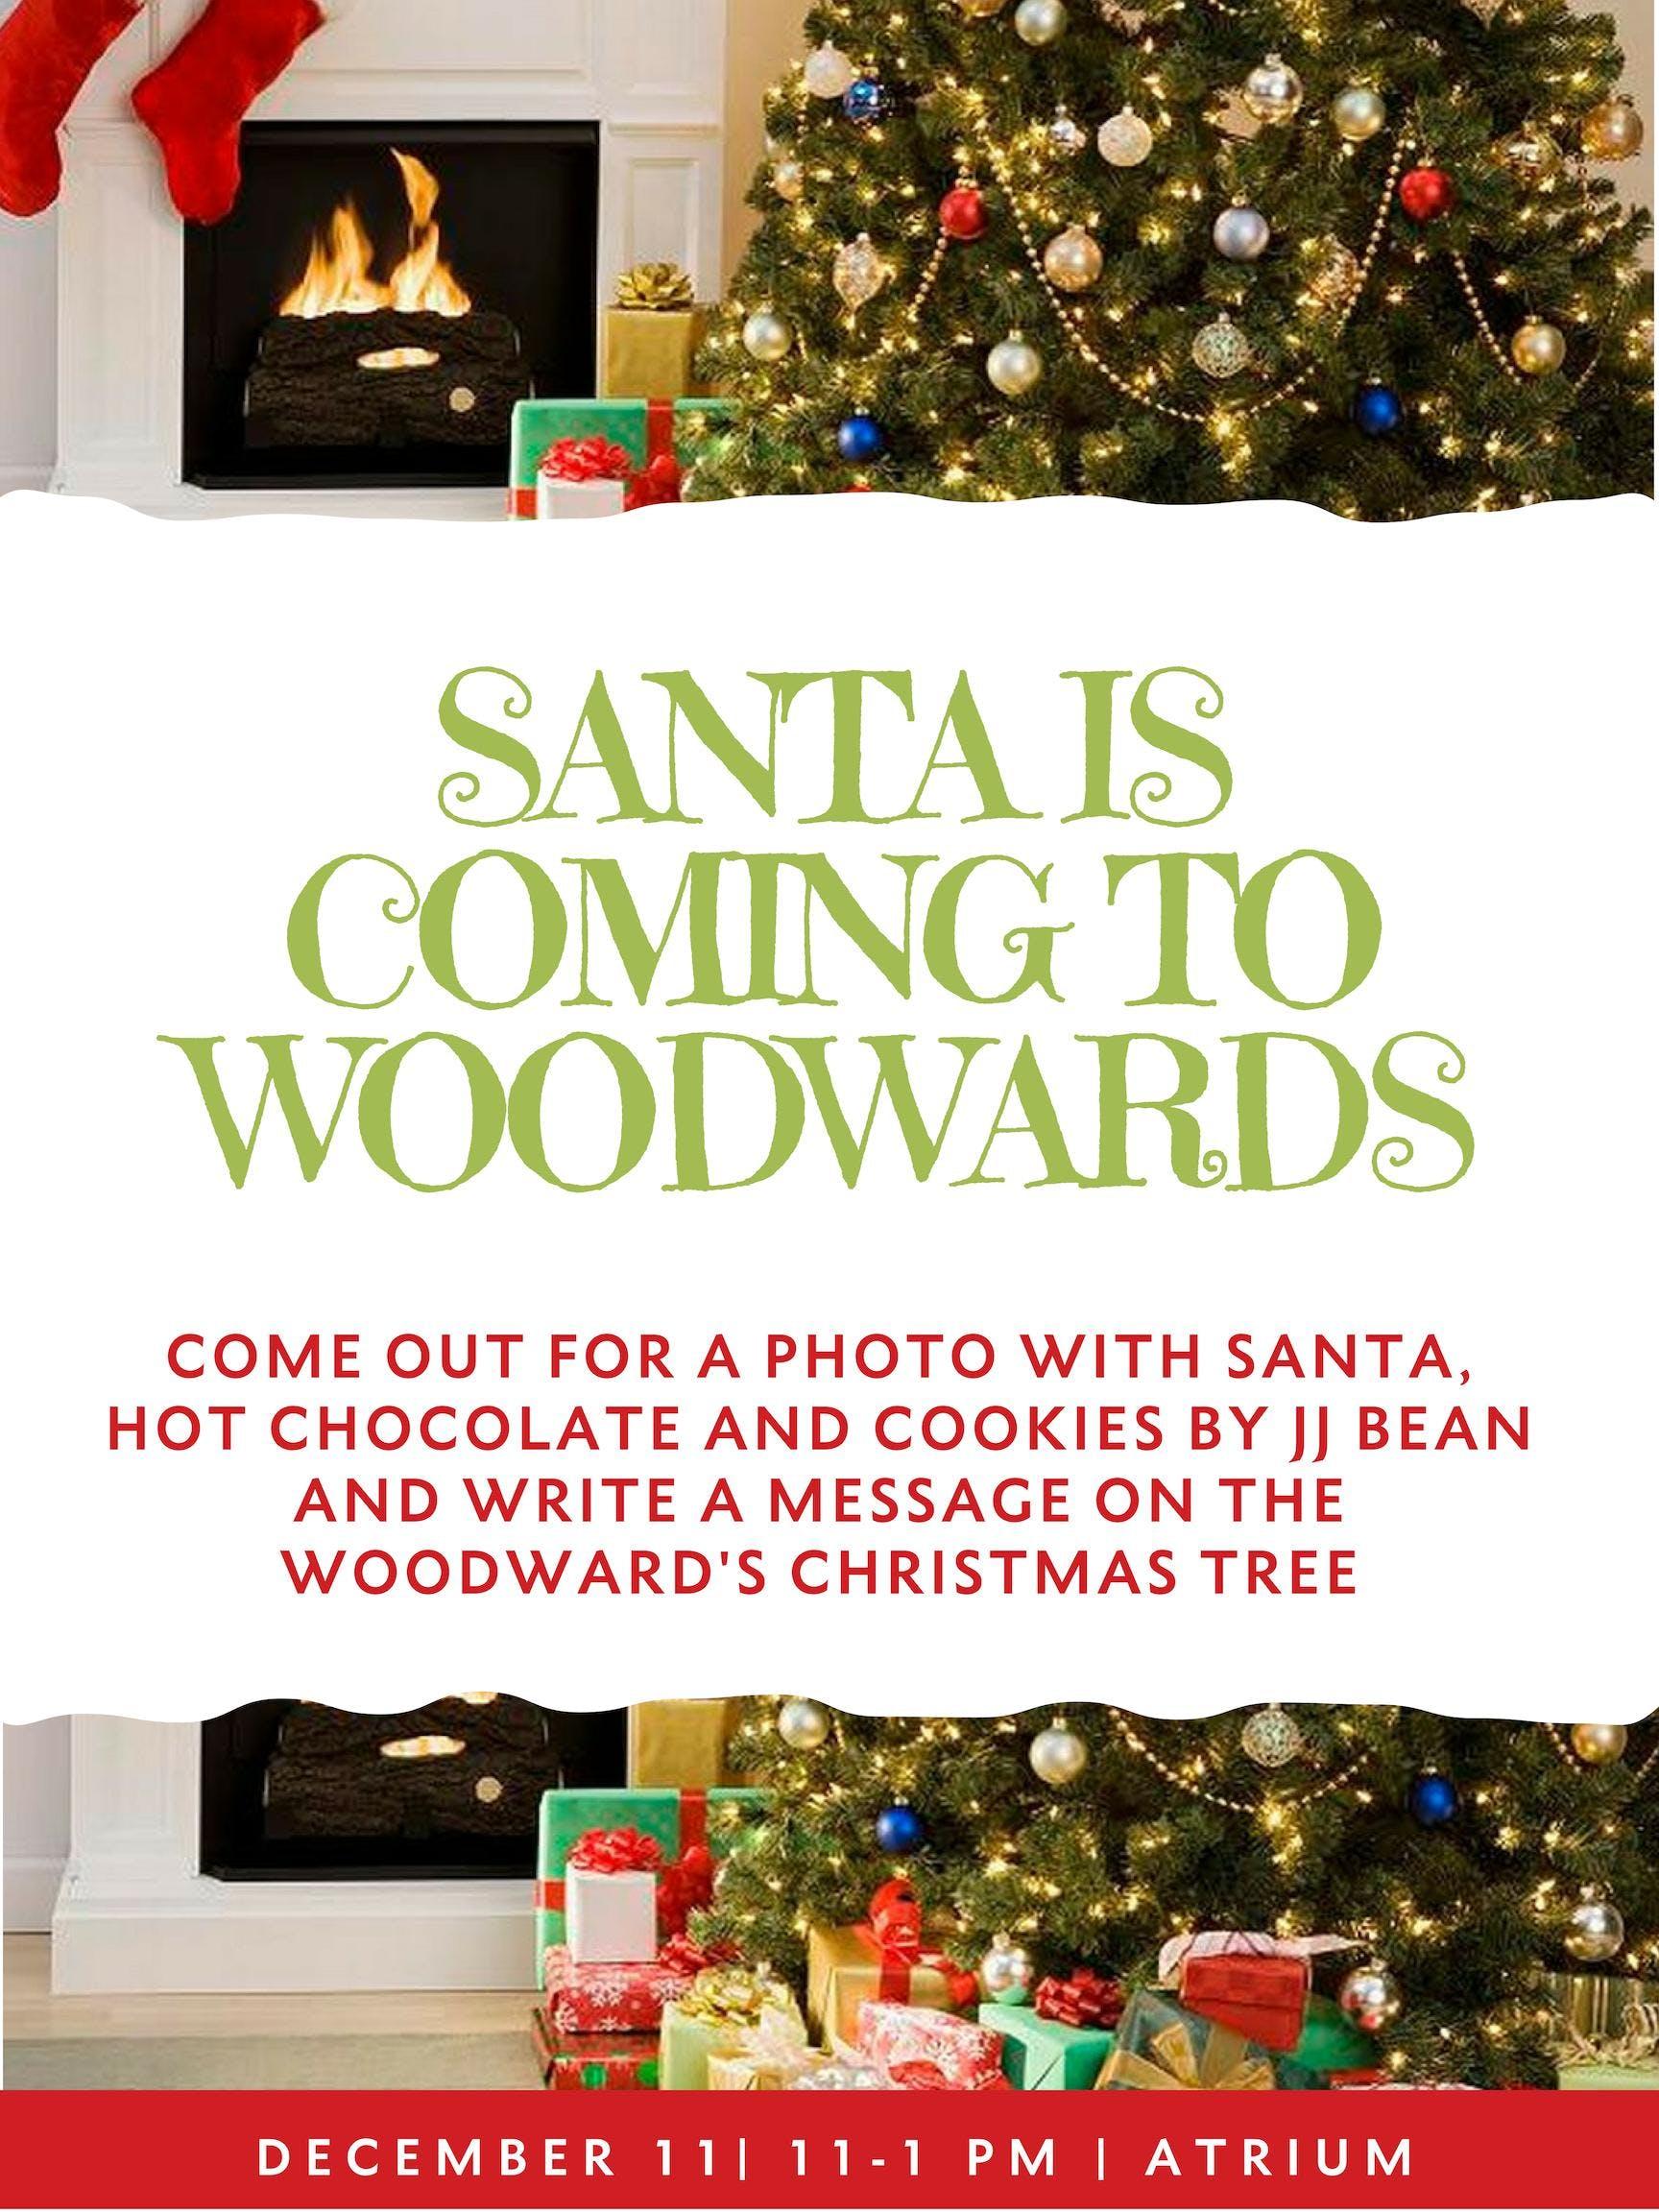 Christmas at Woodwards